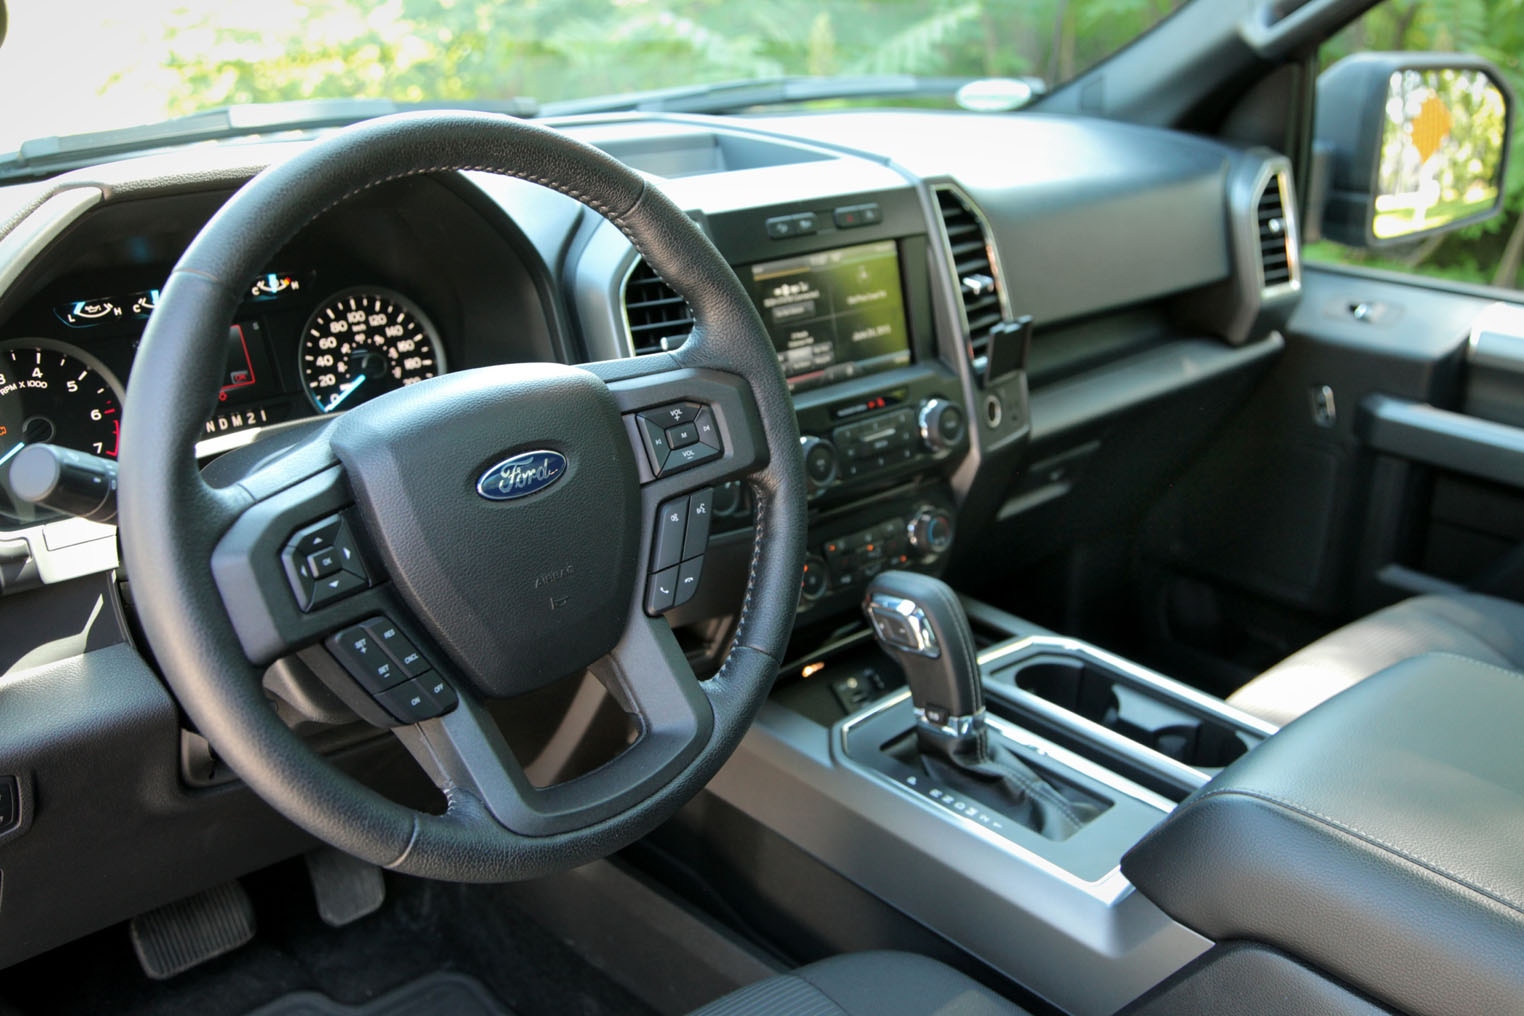 2015 Ford F-150 2.7L EcoBoost vs Ram 1500 EcoDiesel - AutoGuide.com